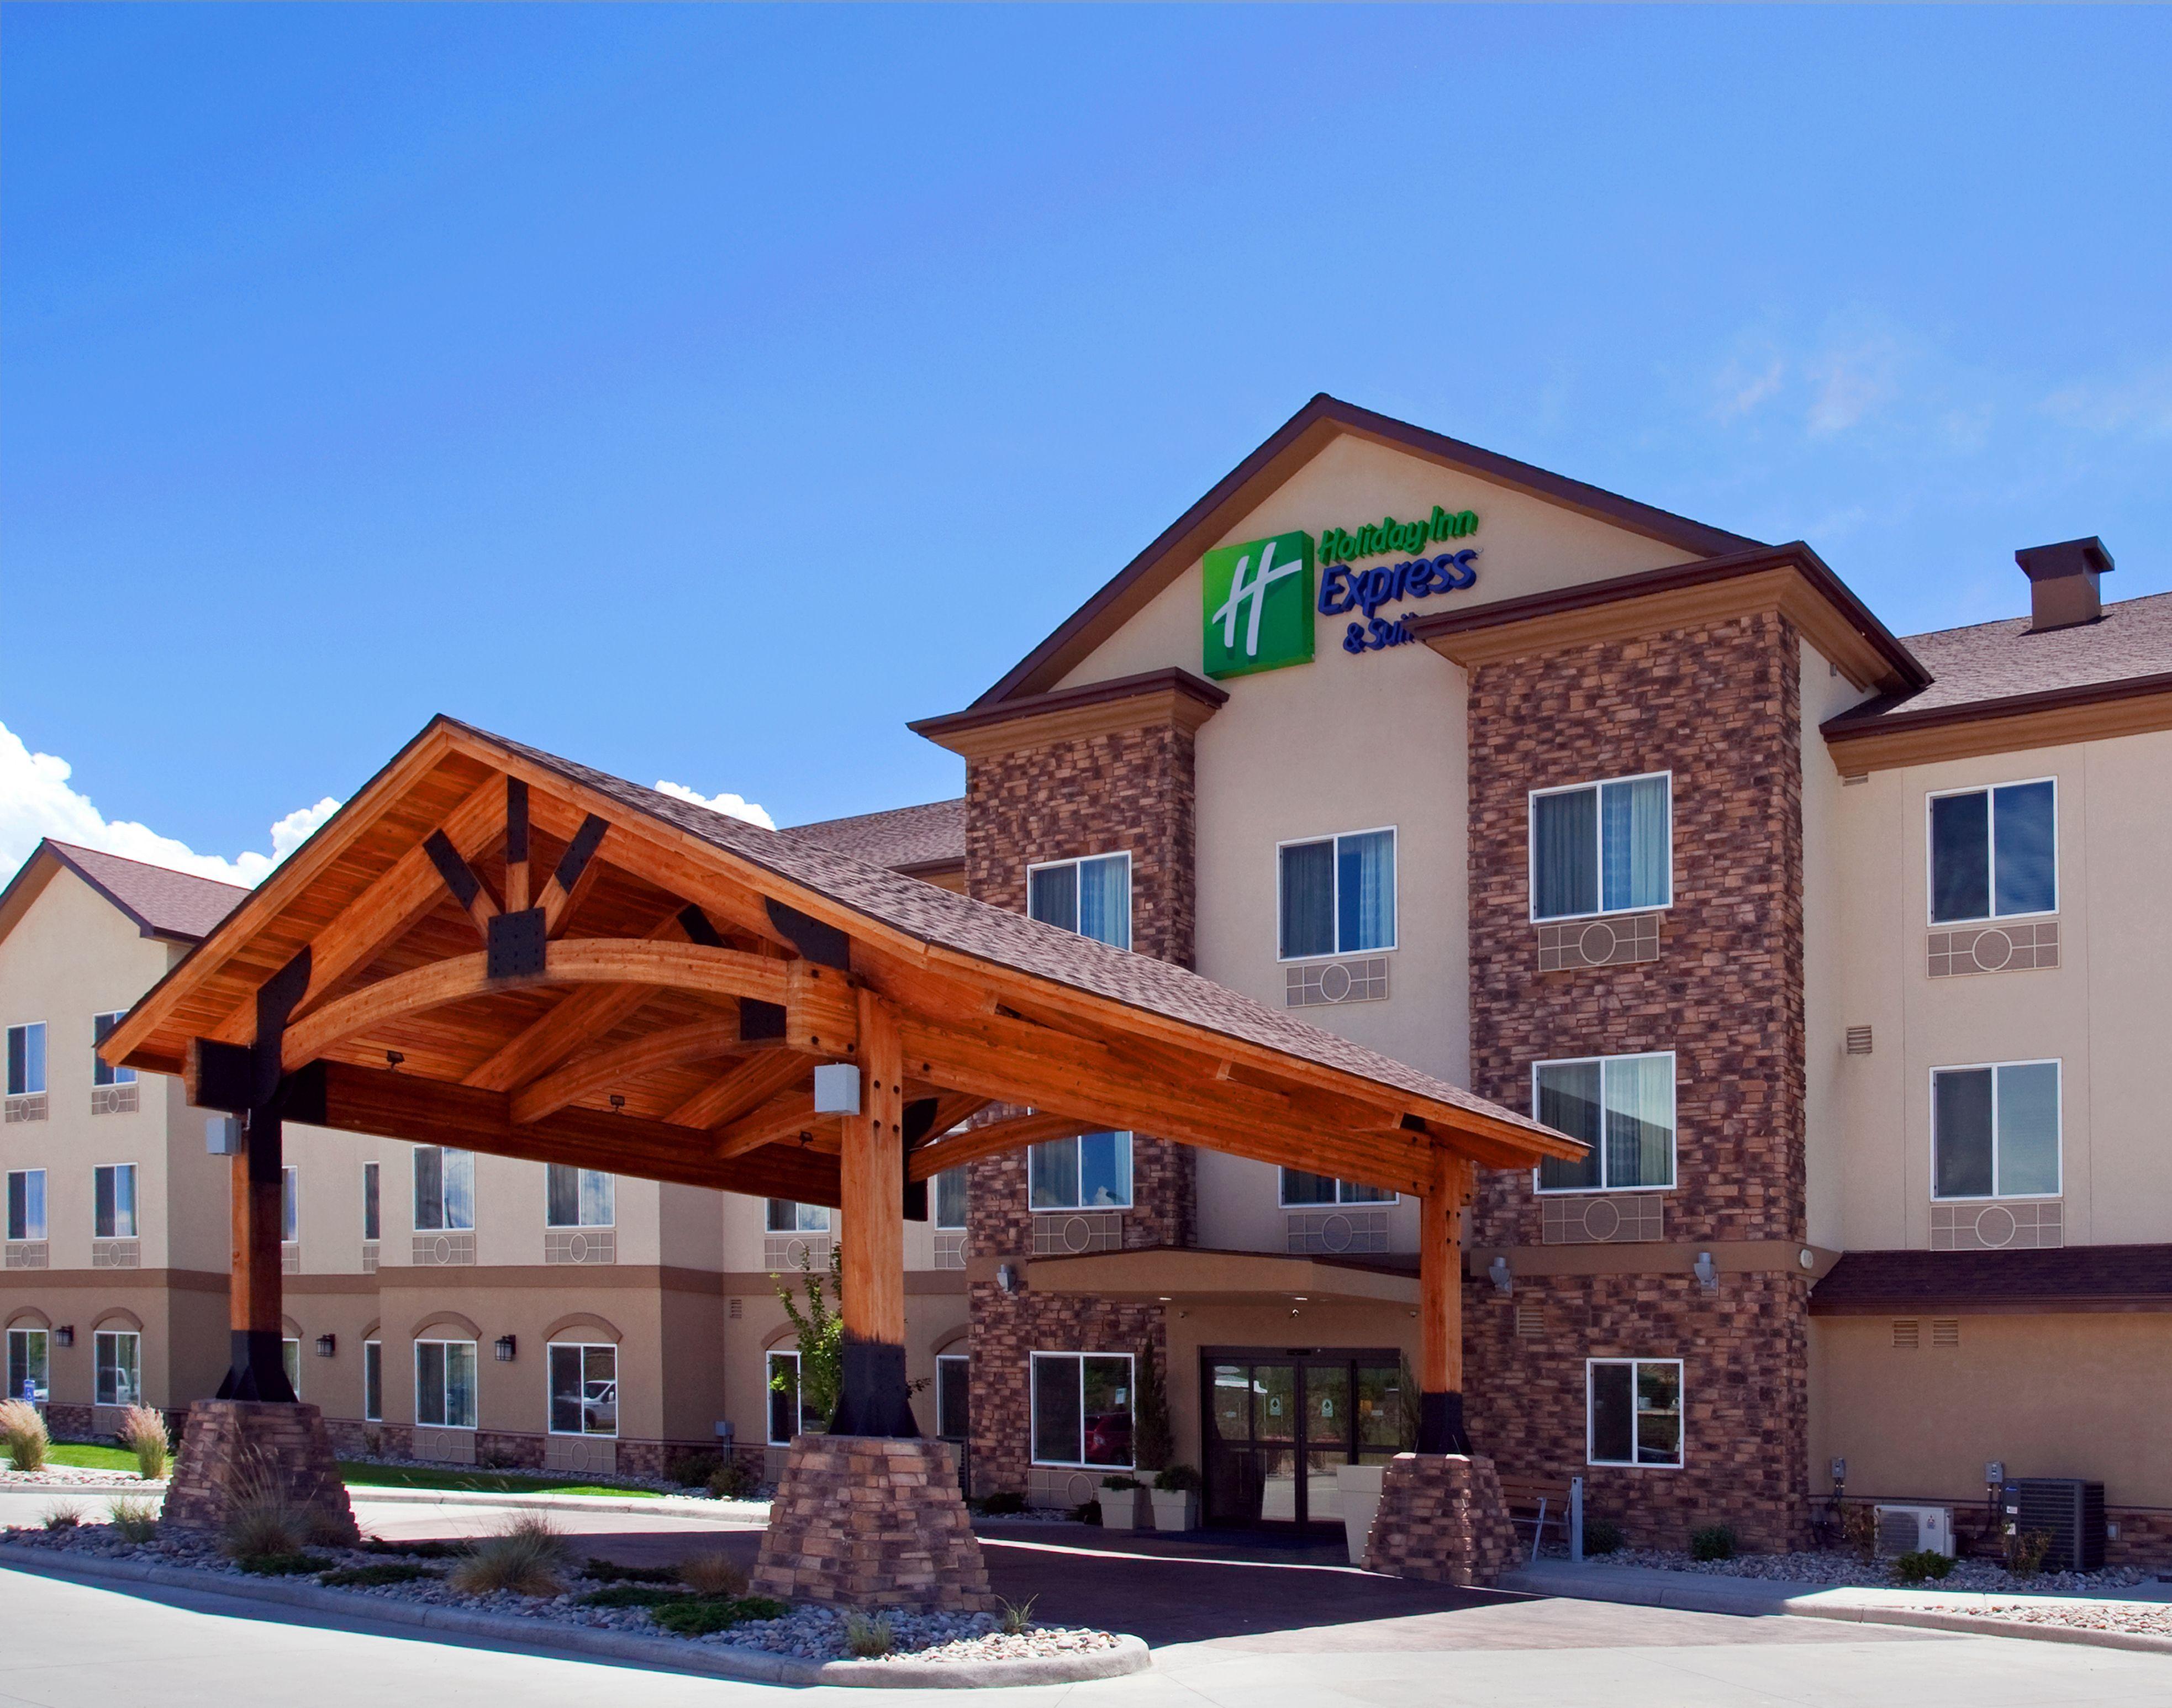 Holiday Inn Express & Suites Sikeston image 4